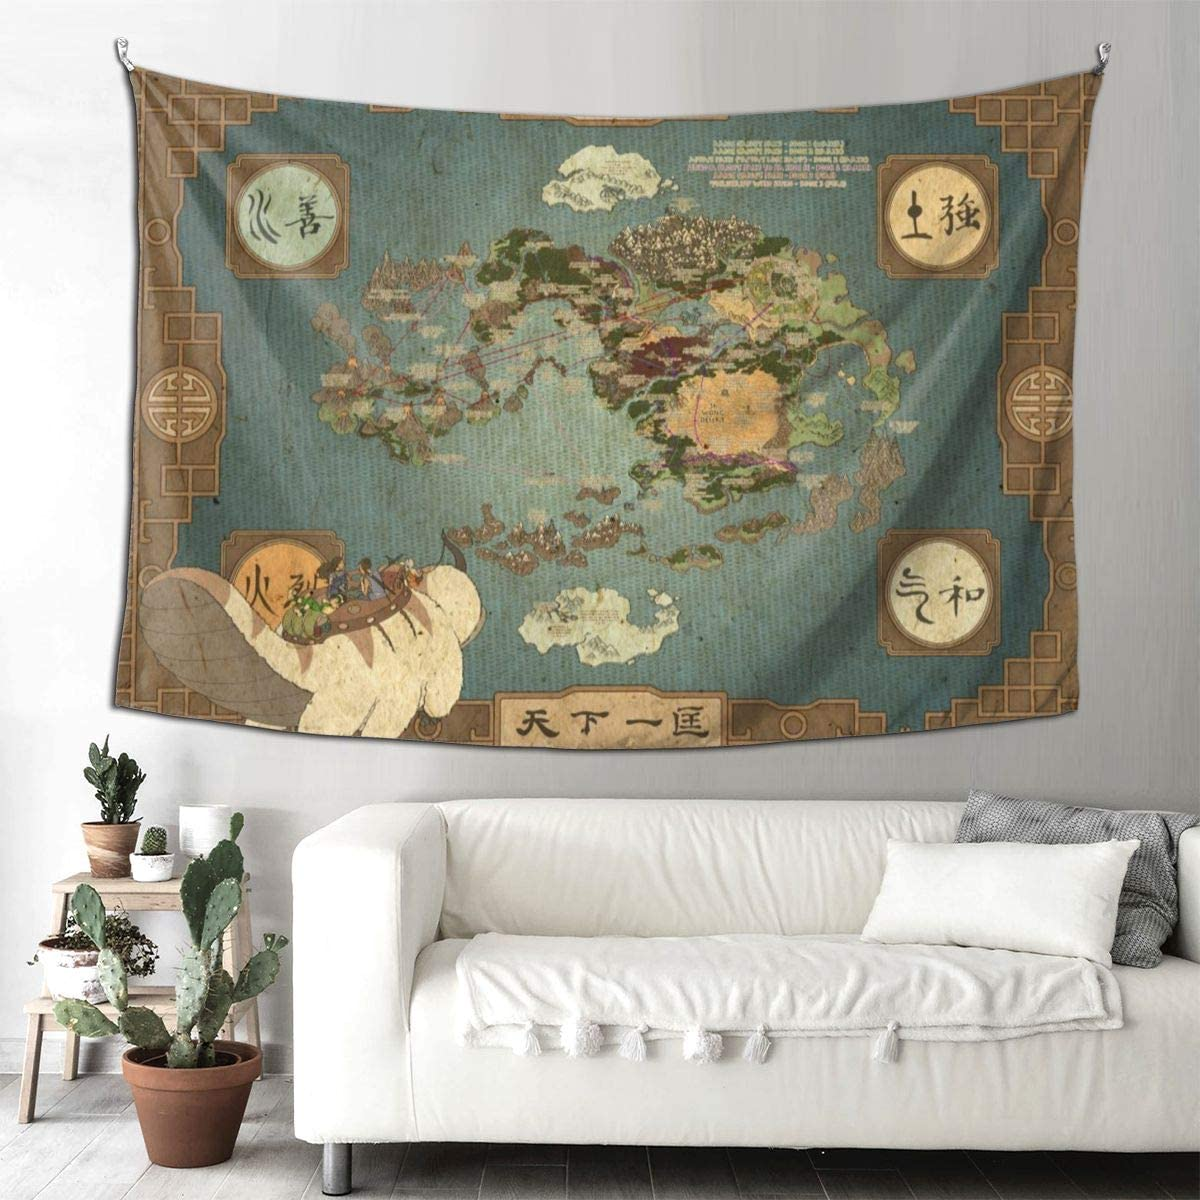 HUADIZ Avatar The Last Airbender Tapestry Wall Hanging 3D Print Boutique Art Blanket for Living Room Bedroom Dorm Decor 90×60 in